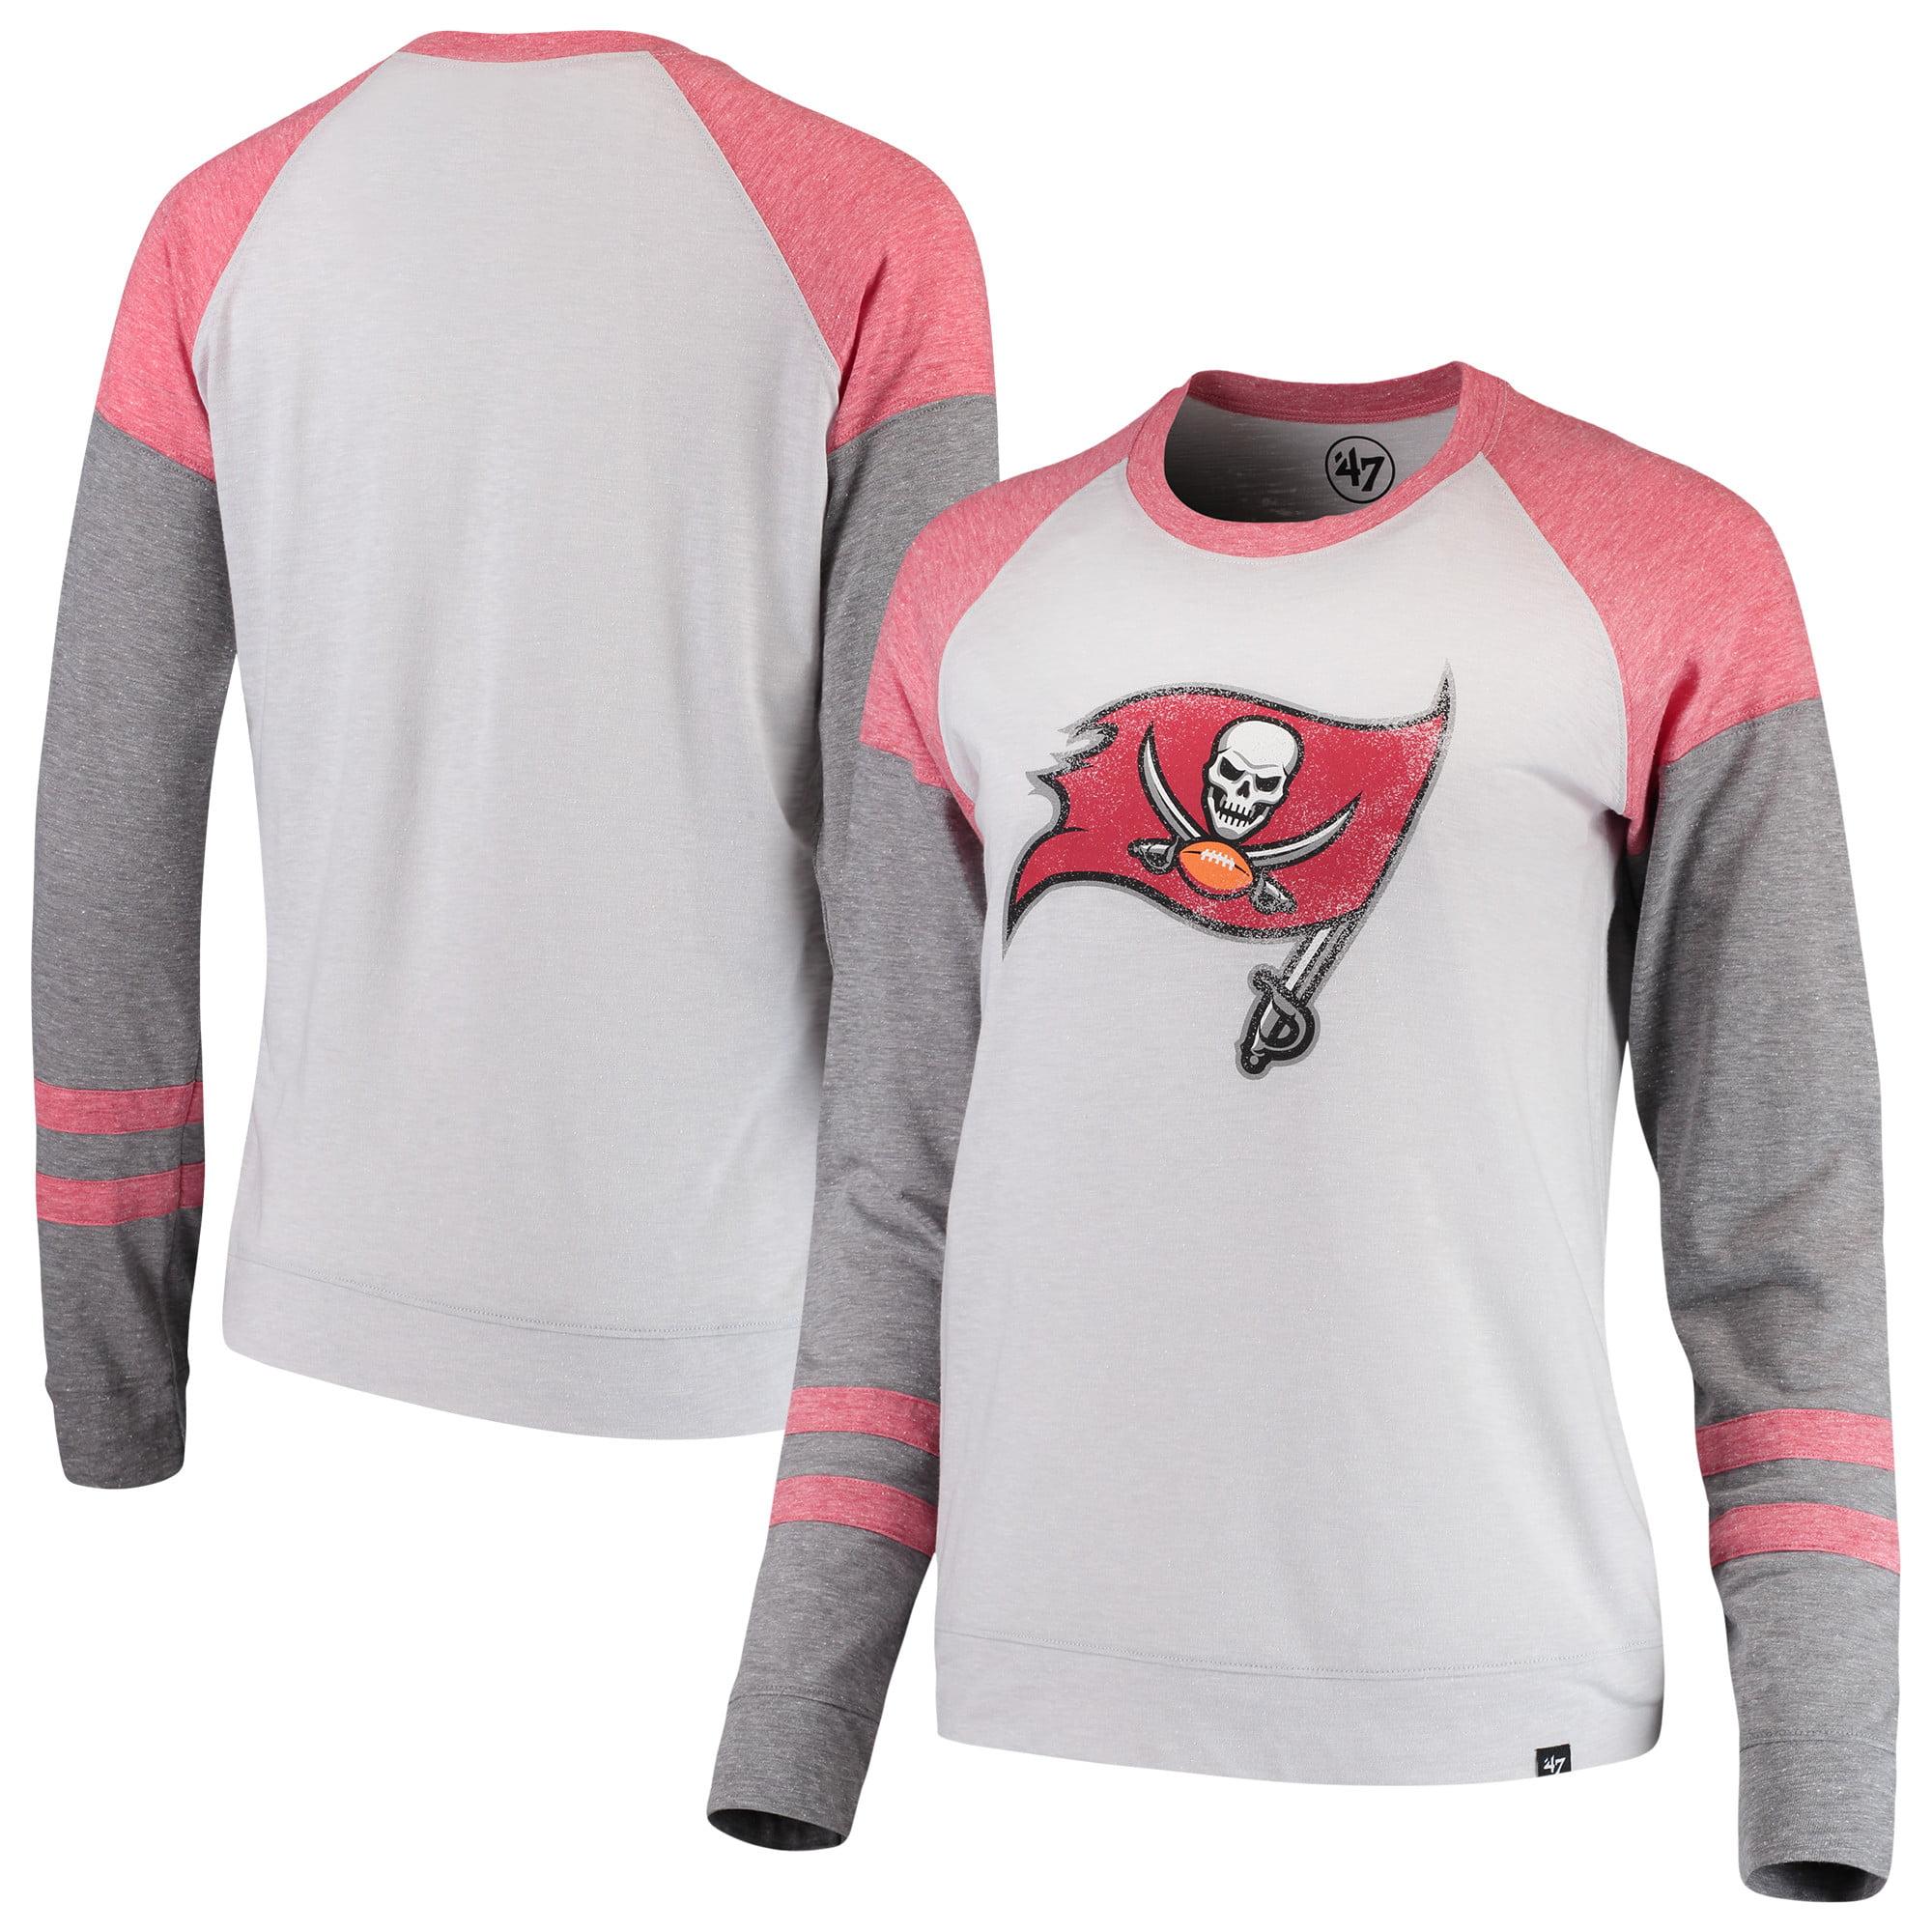 Tampa Bay Buccaneers '47 Women's Match Distressed Raglan T-Shirt - Heathered Gray